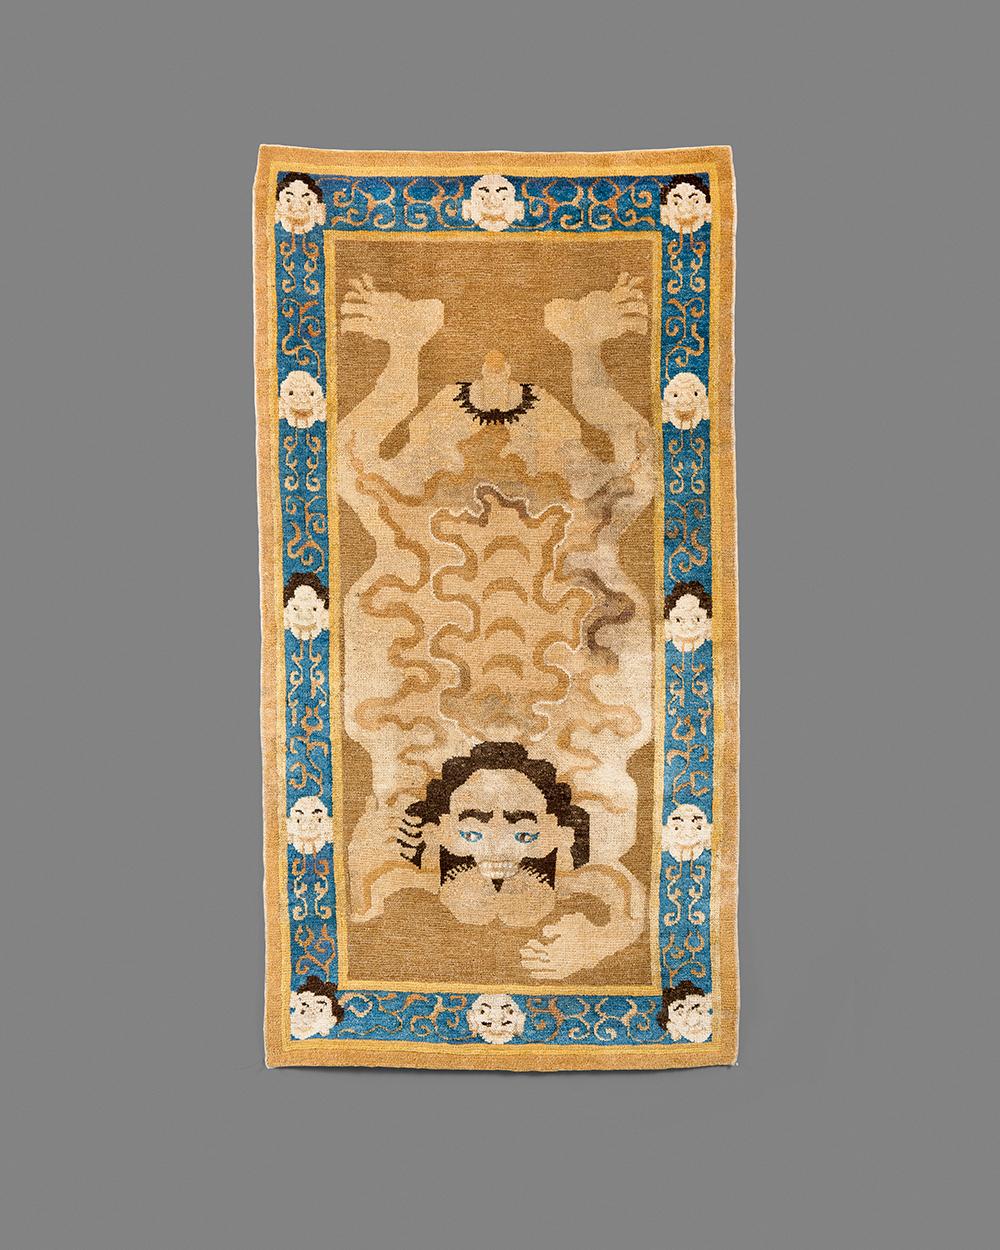 Tibetan Tantric Carpet of a Flayed Man